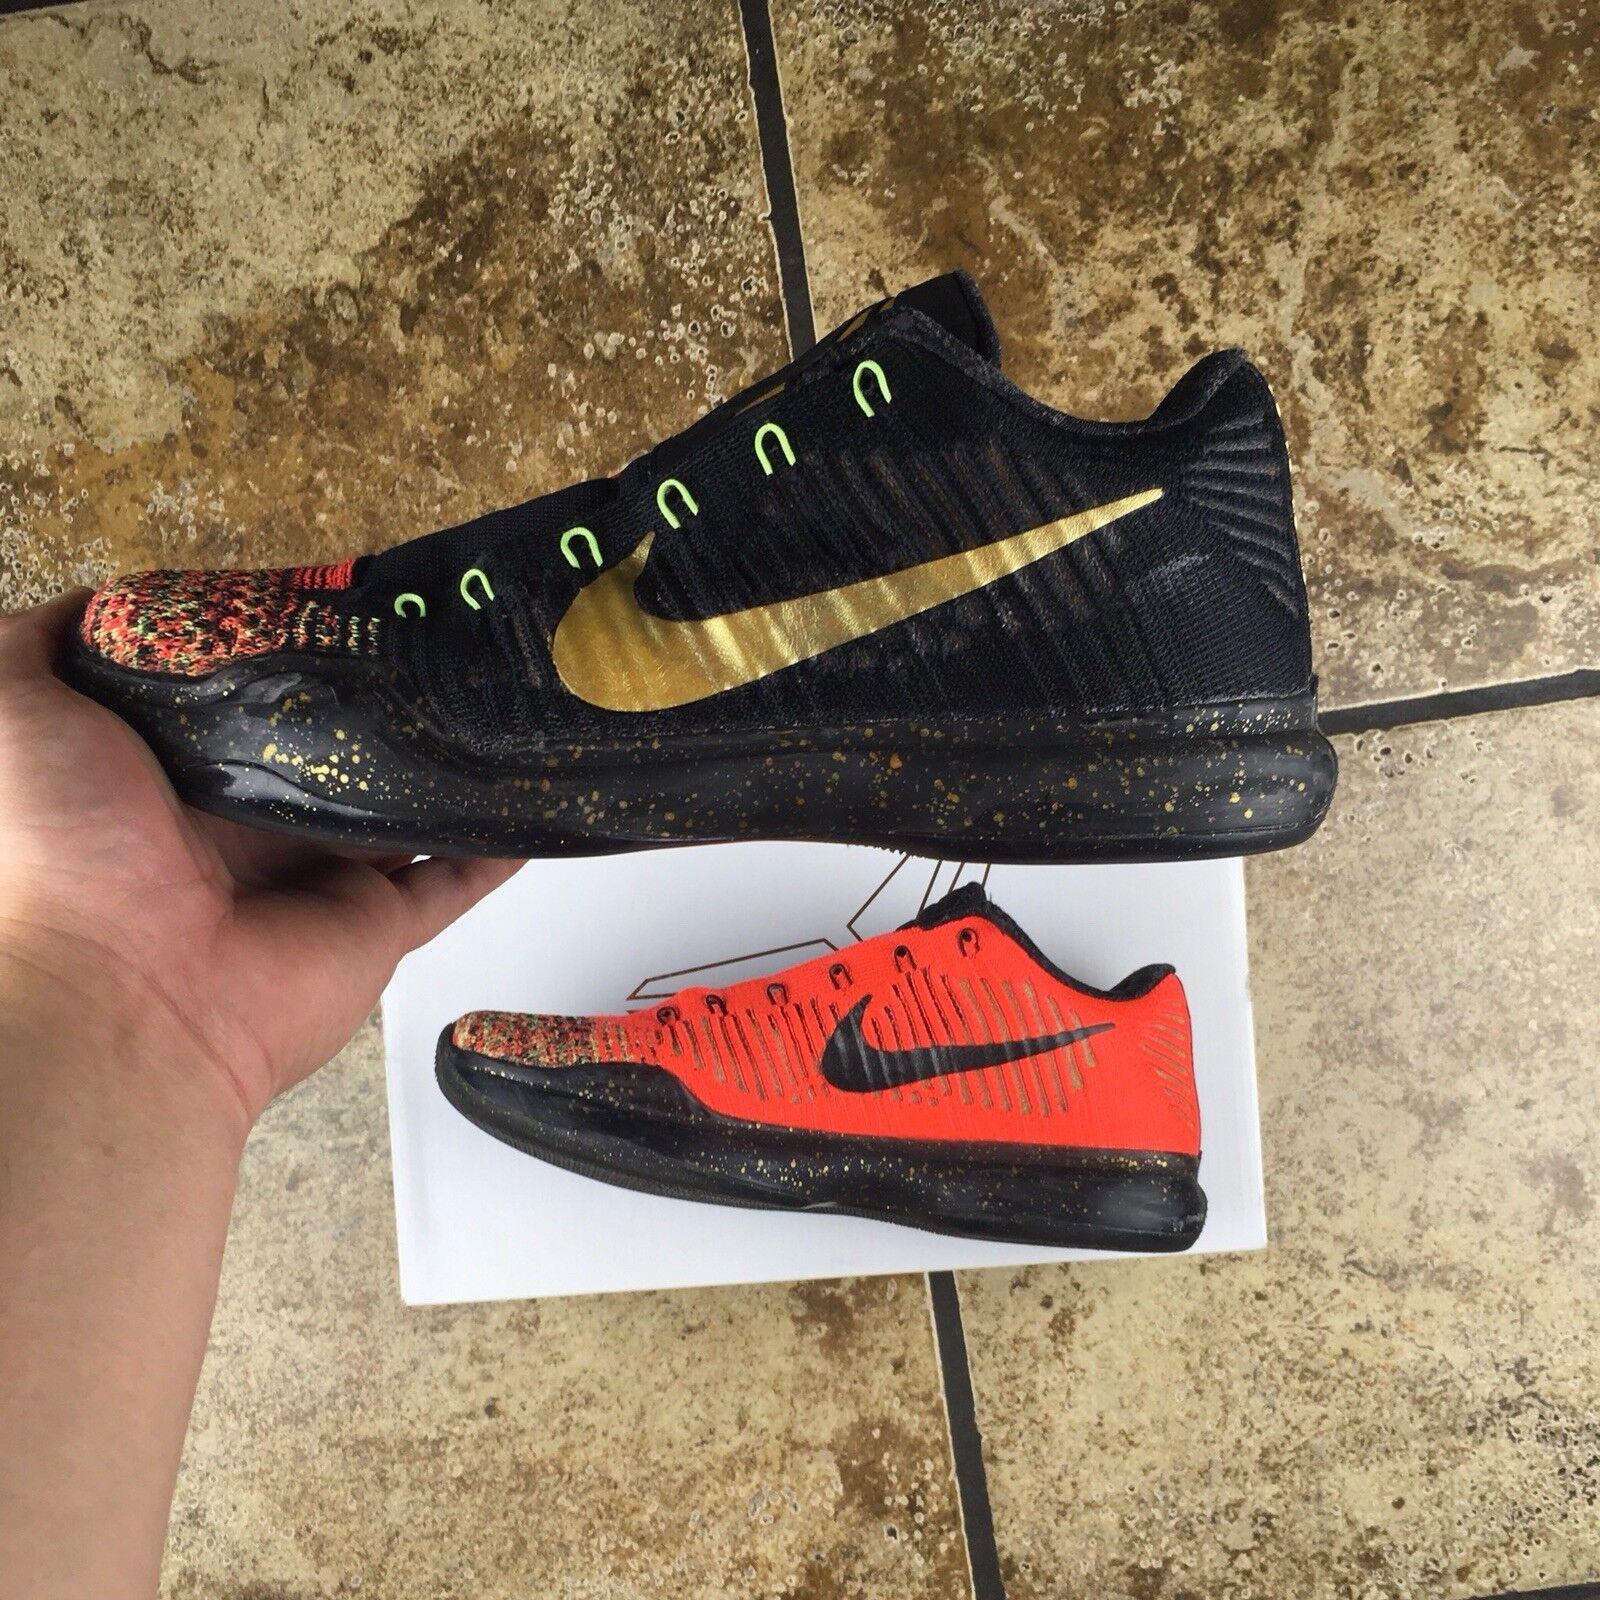 Nike Kobe 10 X Elite Low SZ Christmas 5 Rings Gold Black Red SZ Low ...